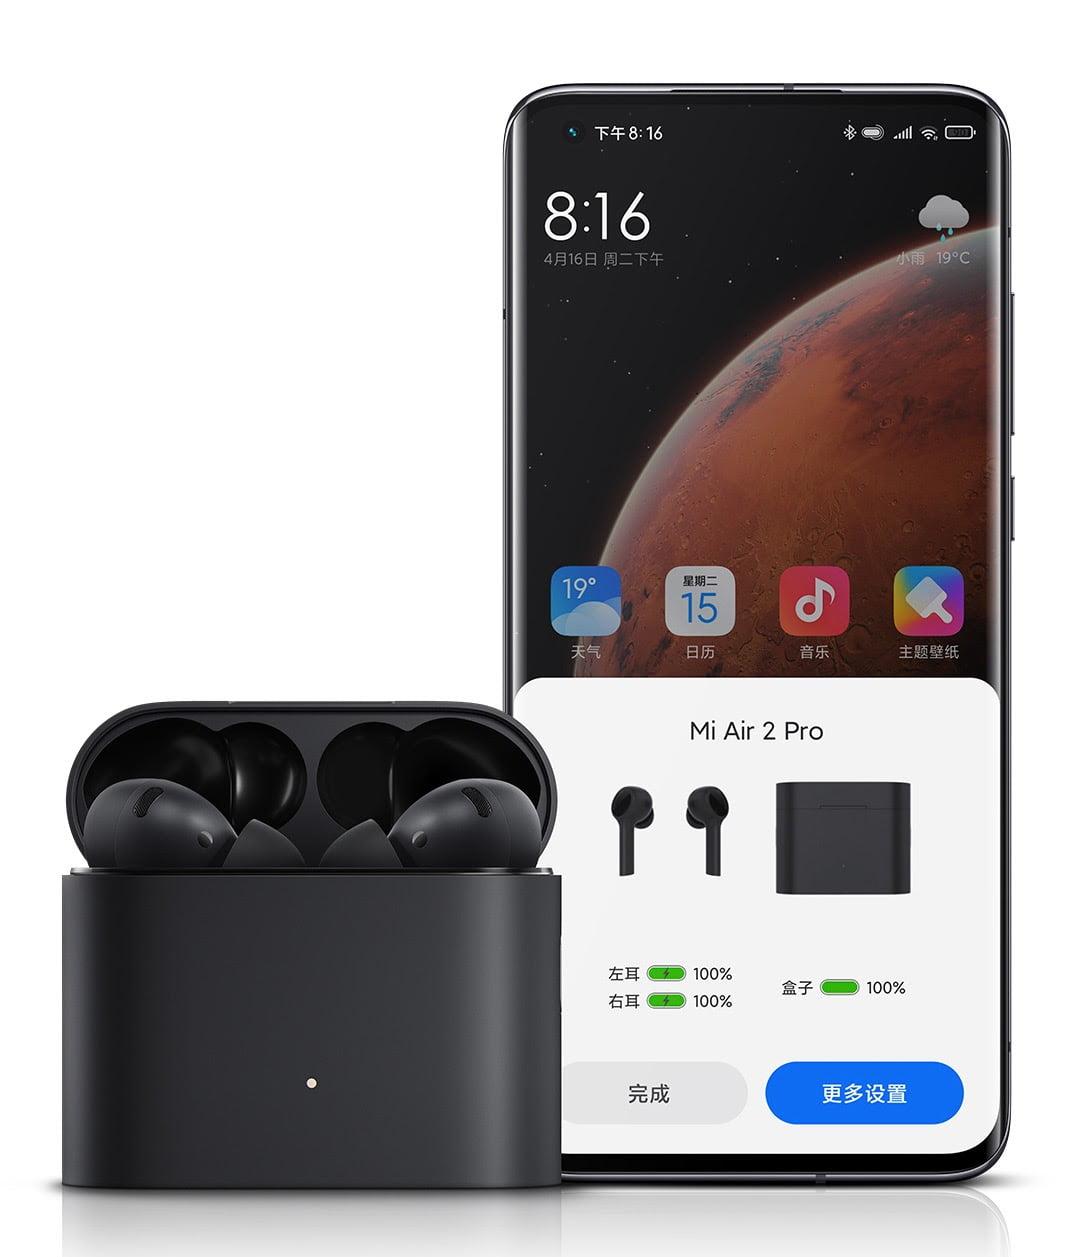 tai nghe bluetooth true wireless xiaomi air 2 pro 60506264abf0a